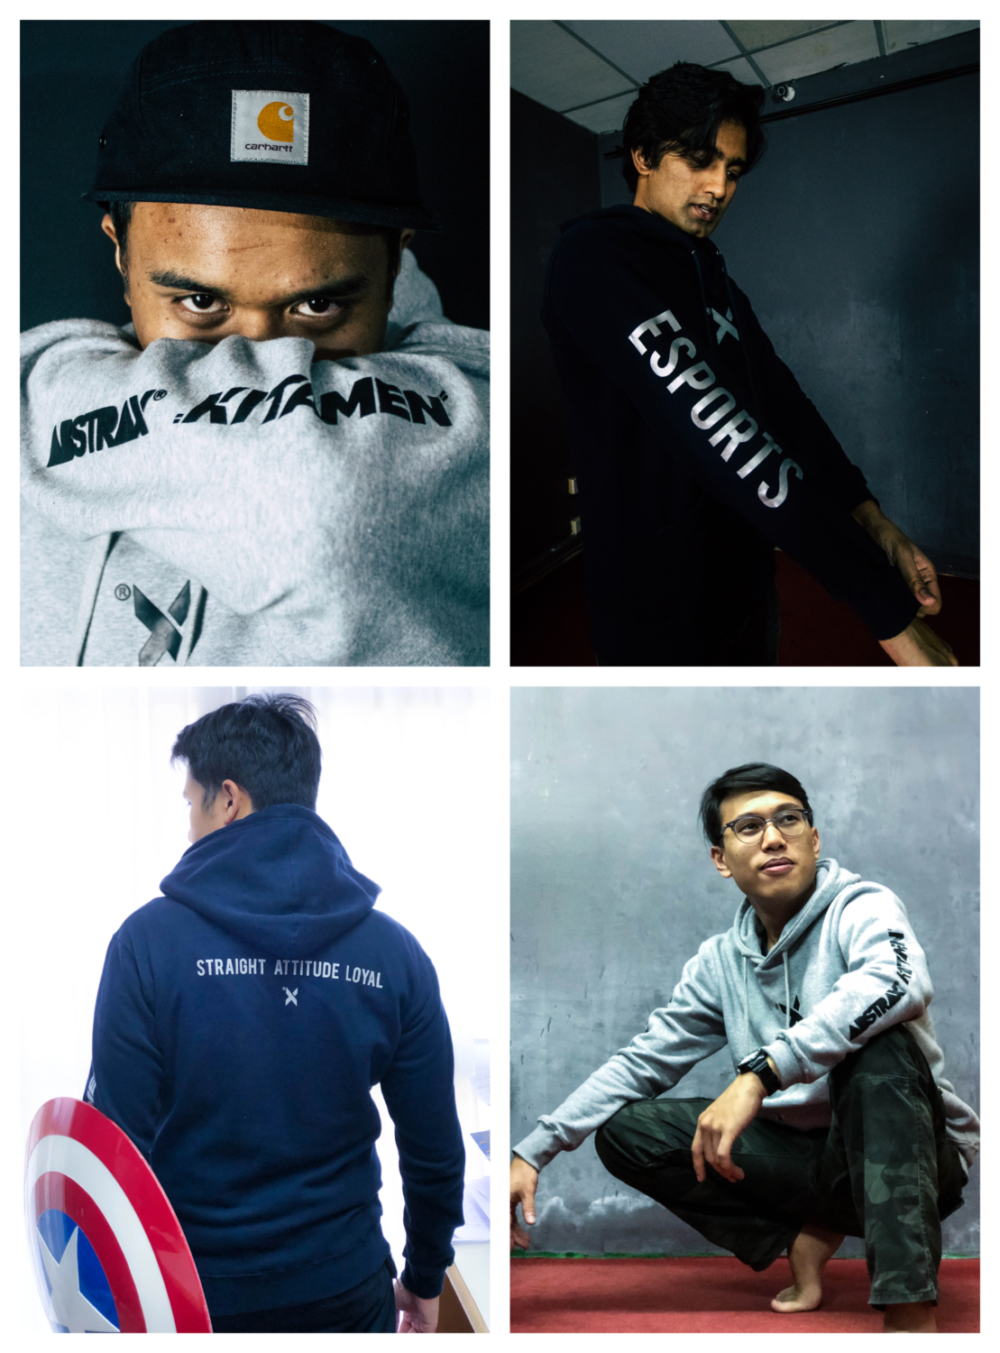 Individual photos collage